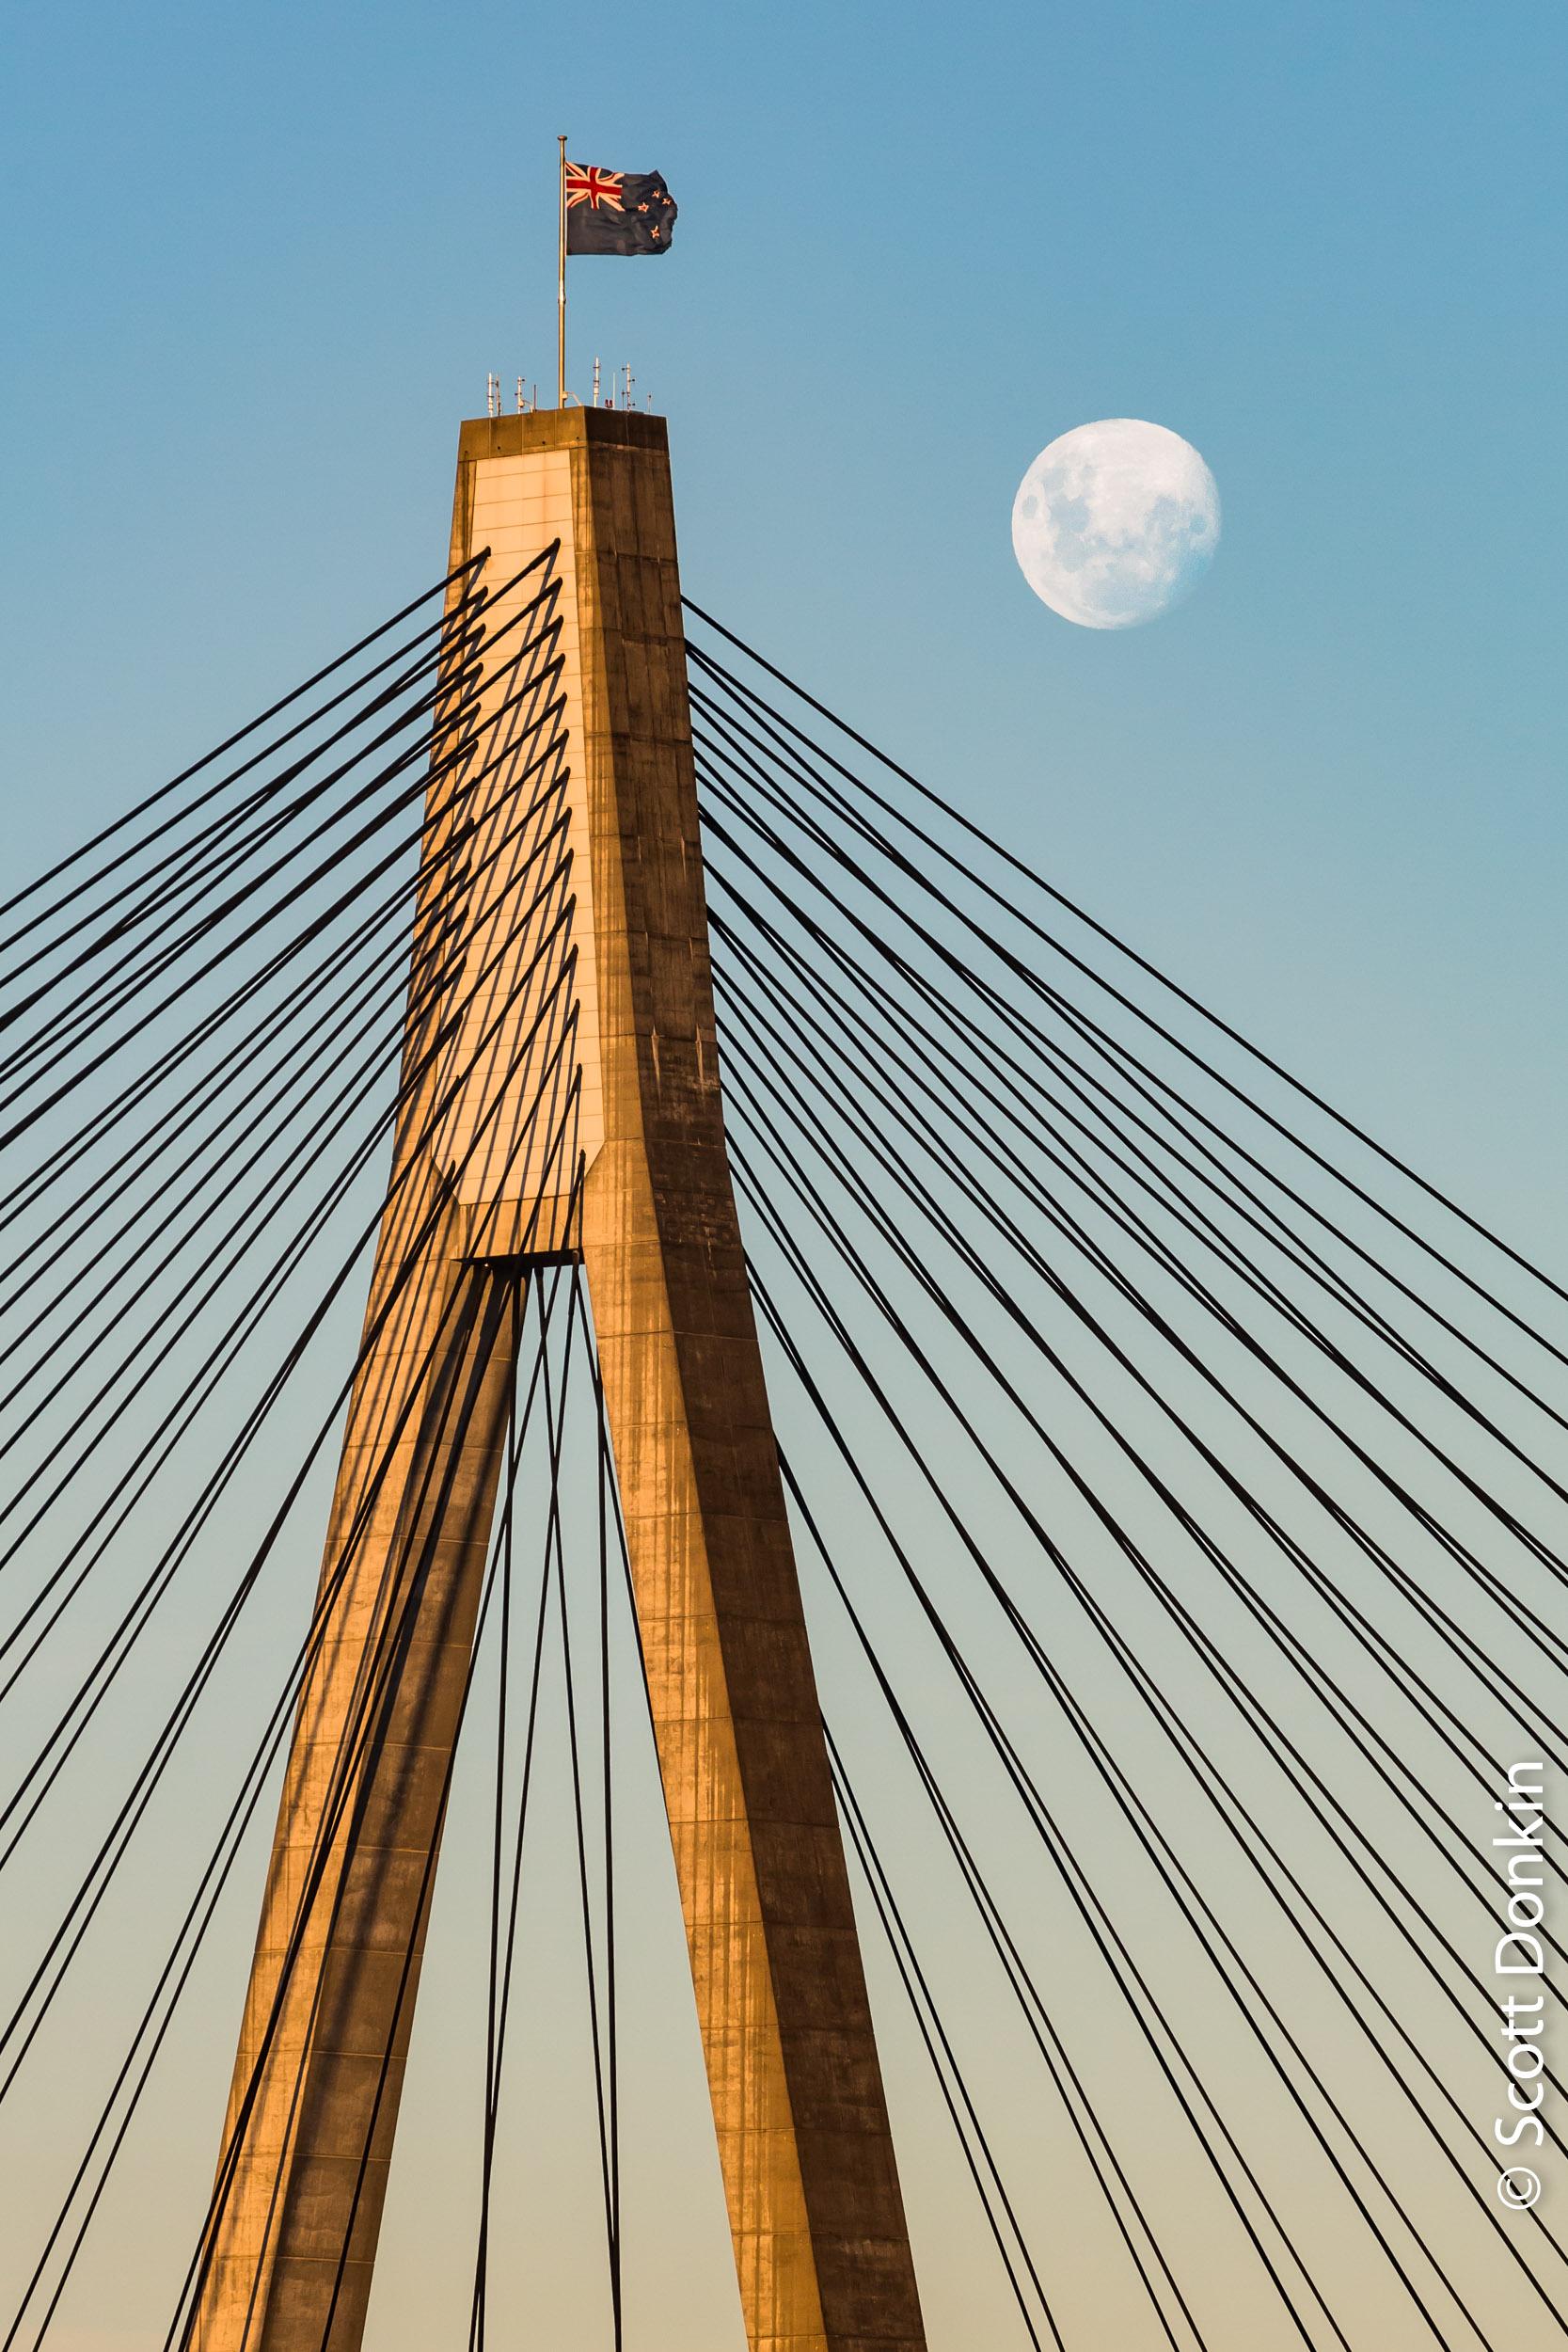 Moonrise over ANZAC Bridge, Sydney. 7:06pm 28 February 2018. Waxing gibbous moon, 96% disc illumination.